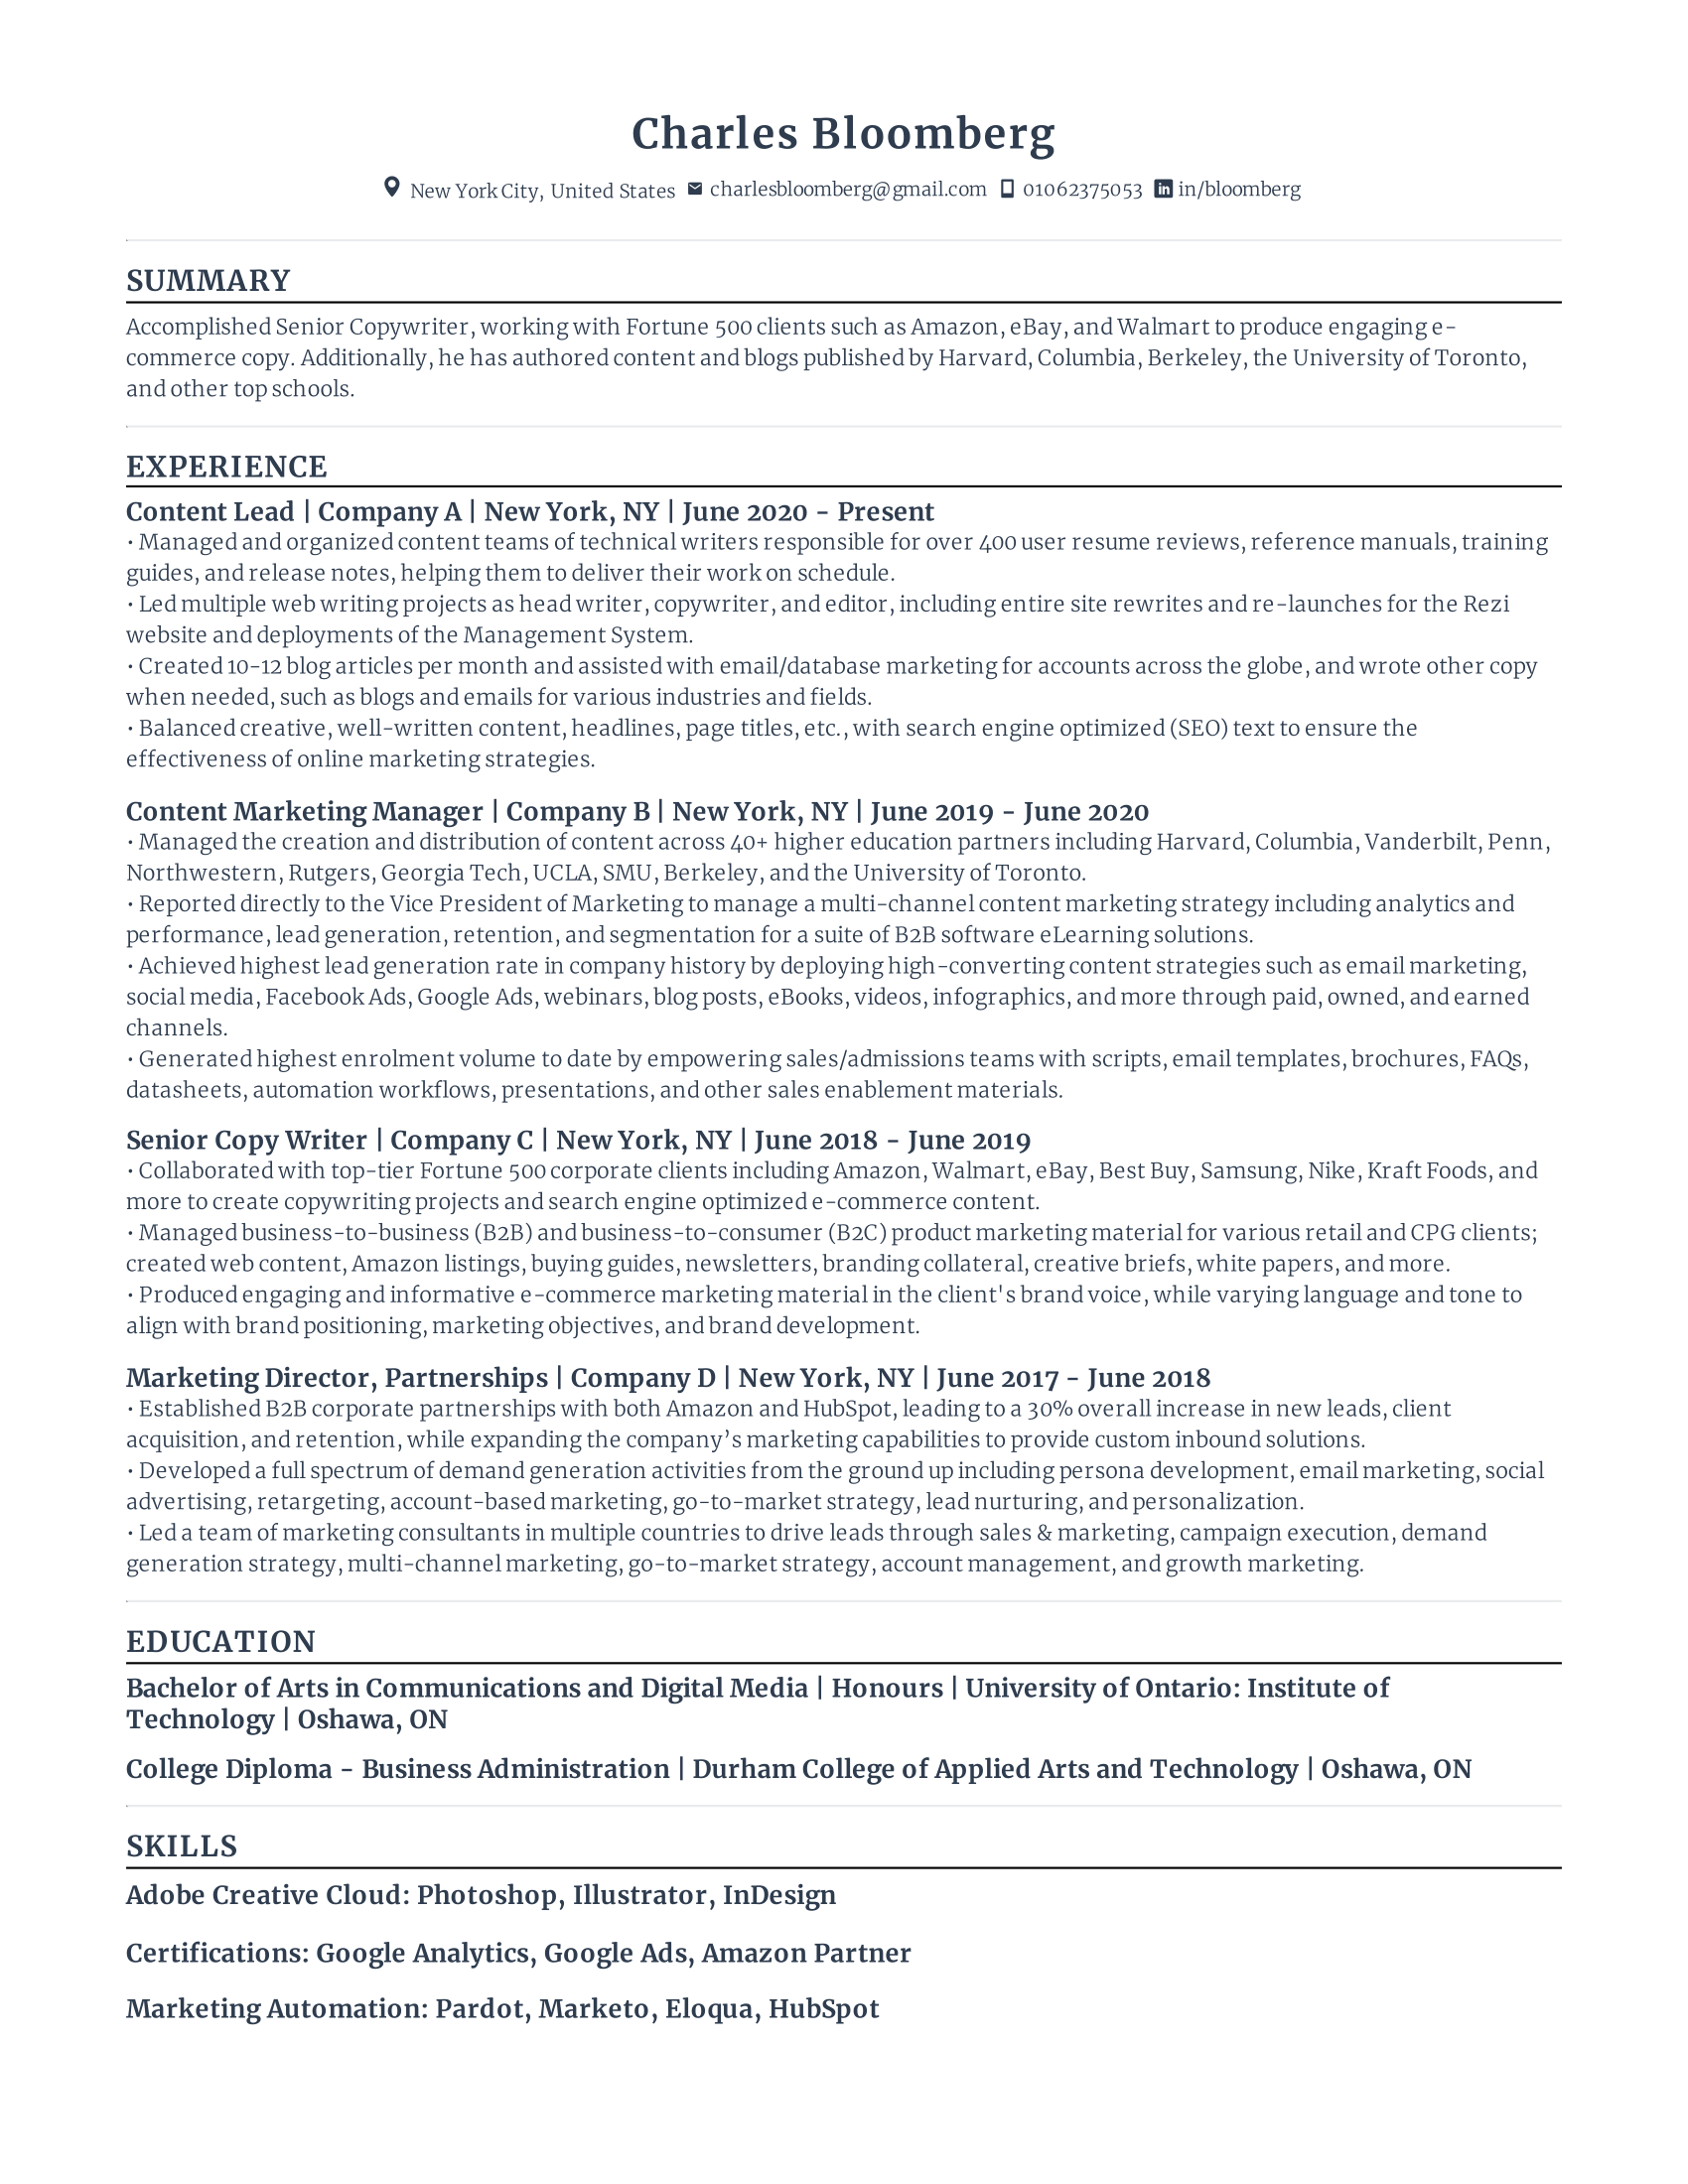 Content Marketing Lead Resume